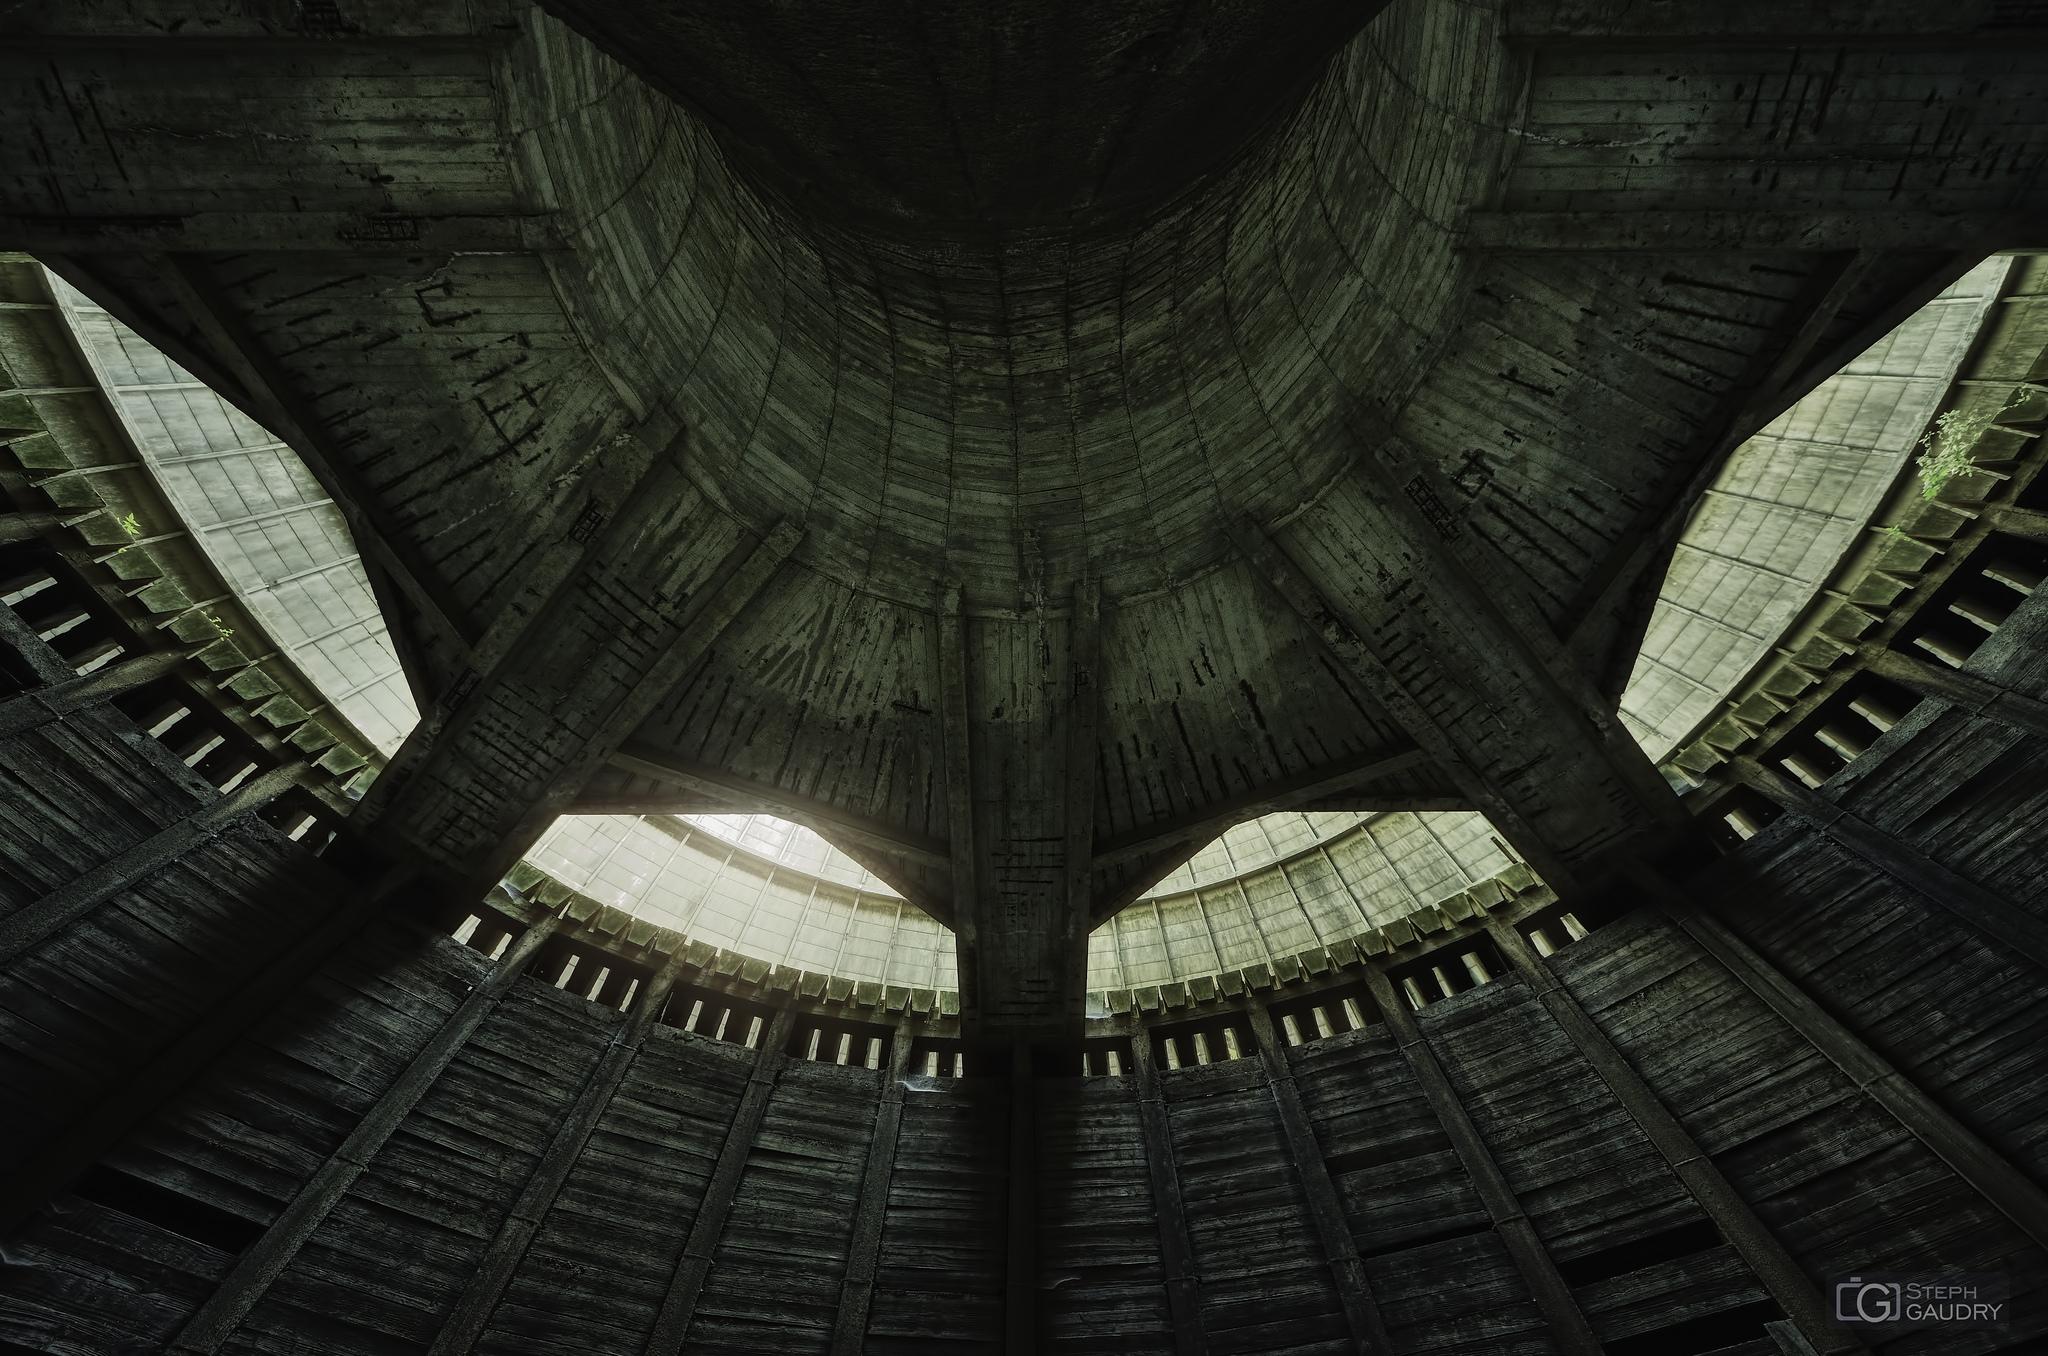 Inside the Death Star (half circle) [Klik om de diavoorstelling te starten]